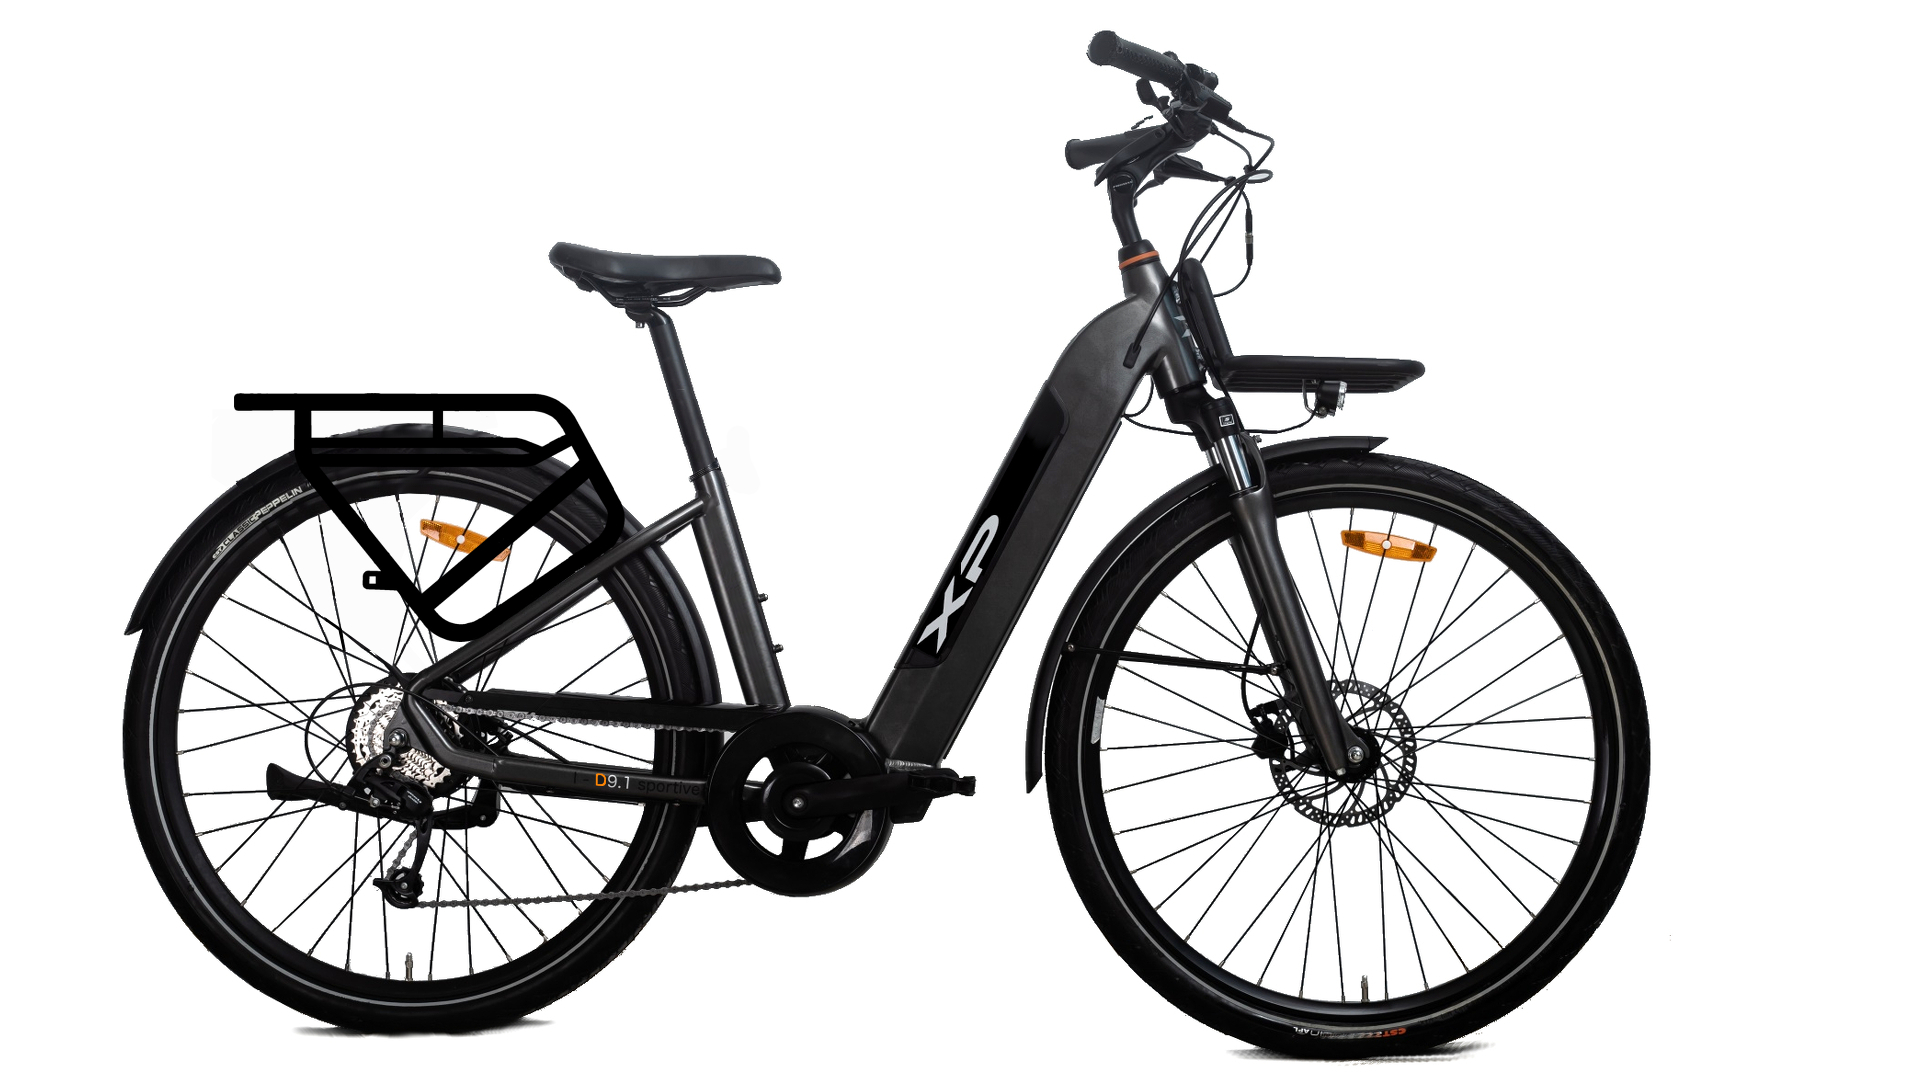 greenbike pesaro-bici elettriche-XP bikes-I-D9.1 donna